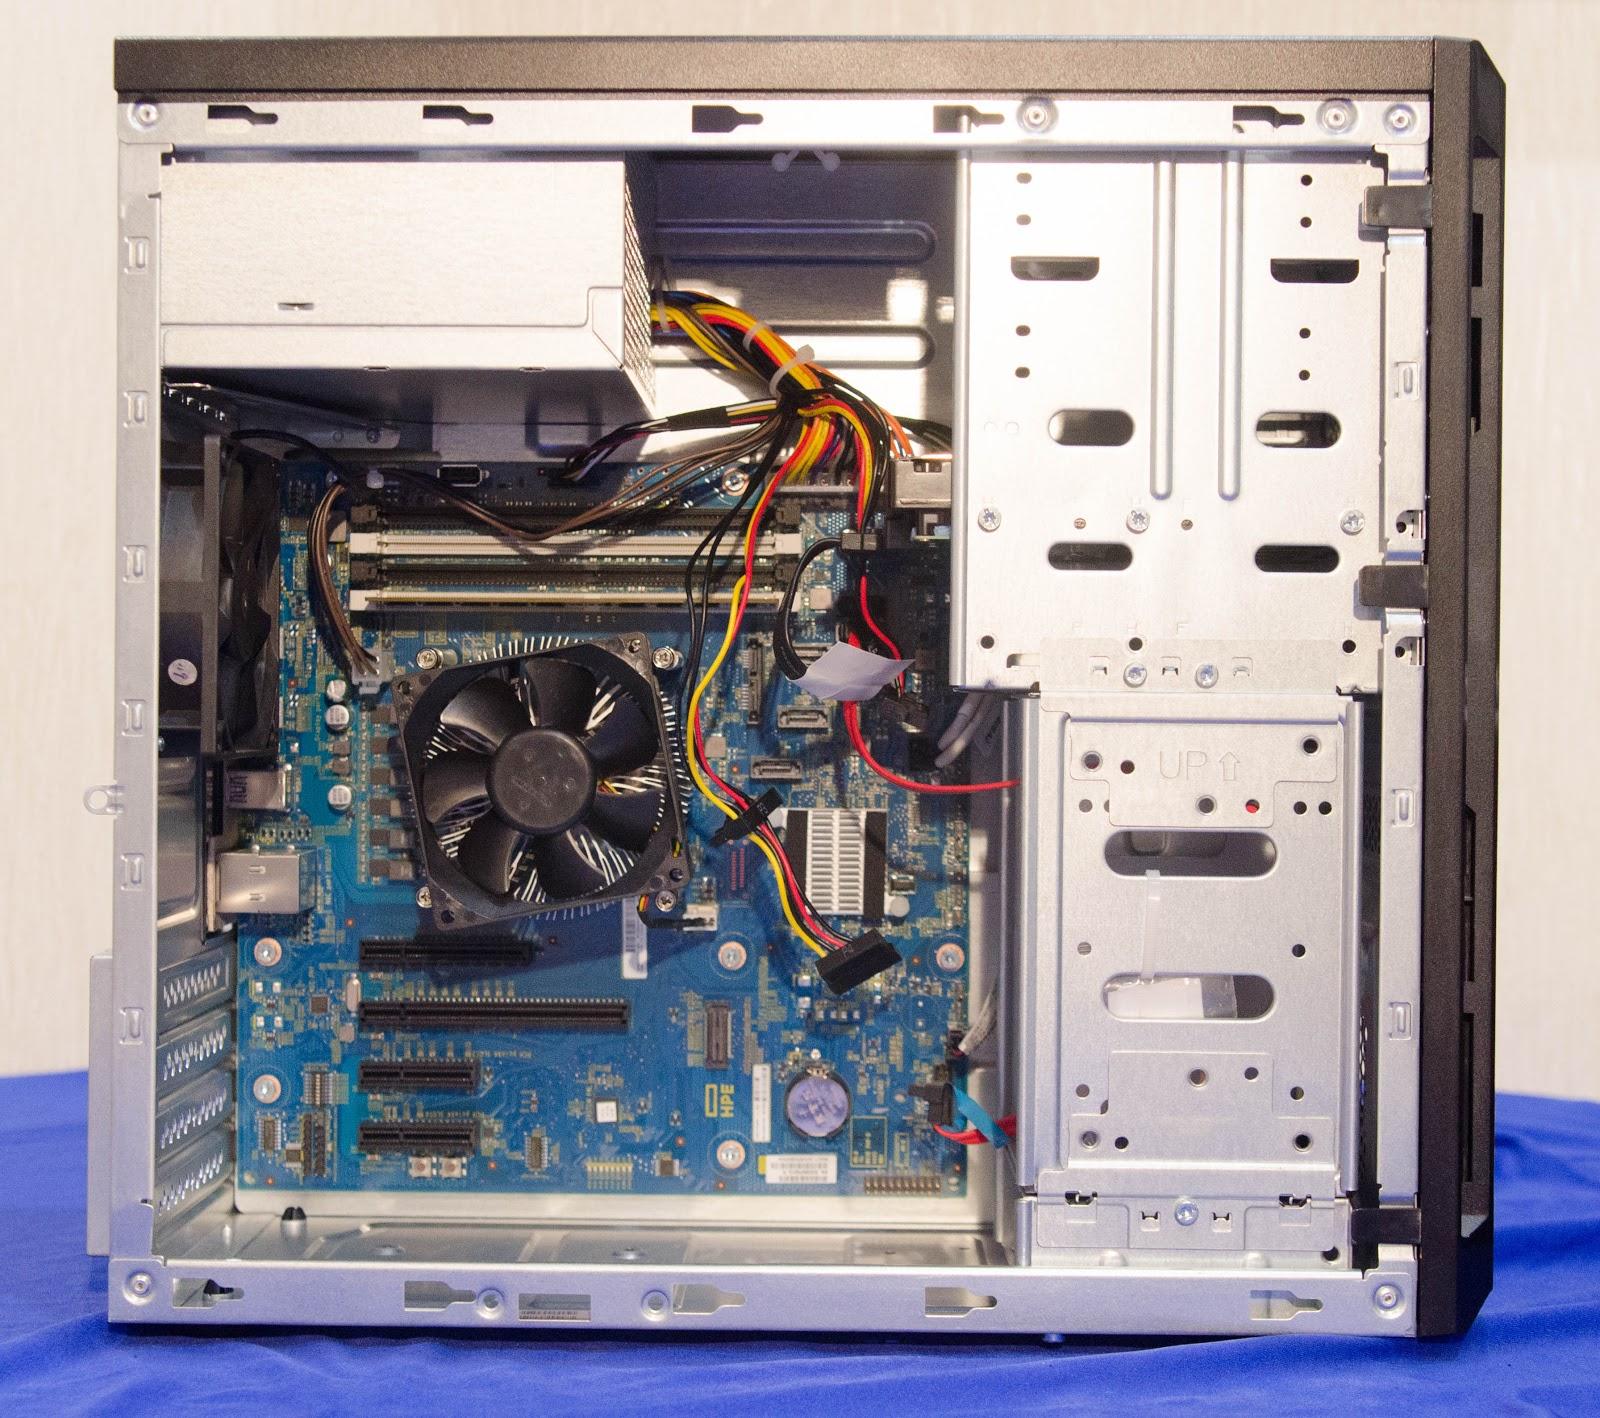 MаL, да удал: Обзор младших серверов линейки HPE ProLiant ML - 3